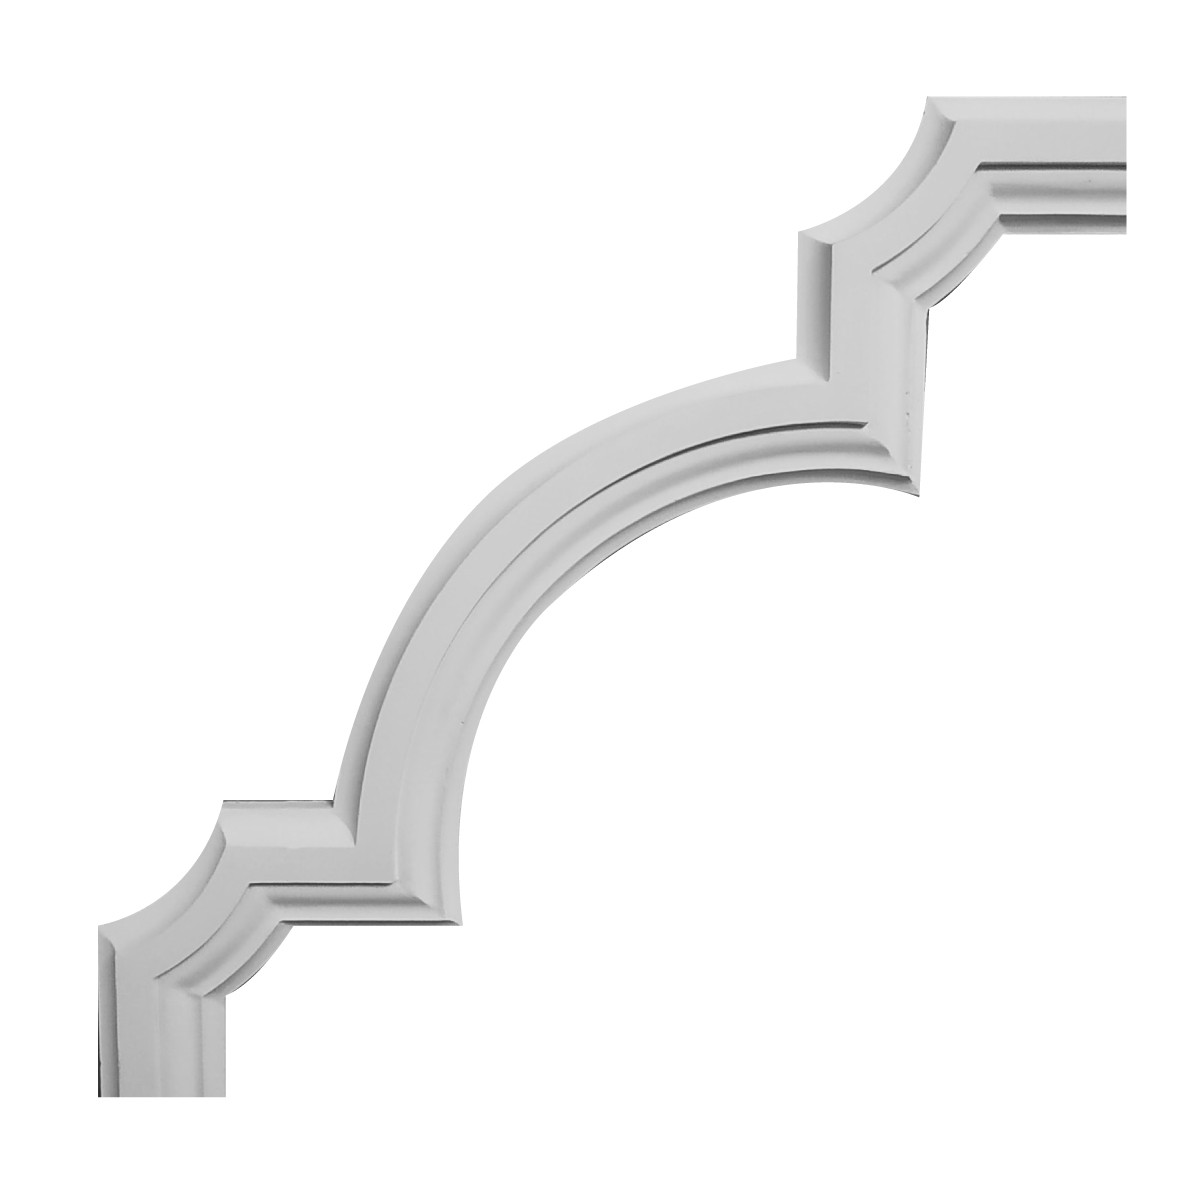 Гипсовая лепнина декоративный угол у-29 h290х290мм, фото 1